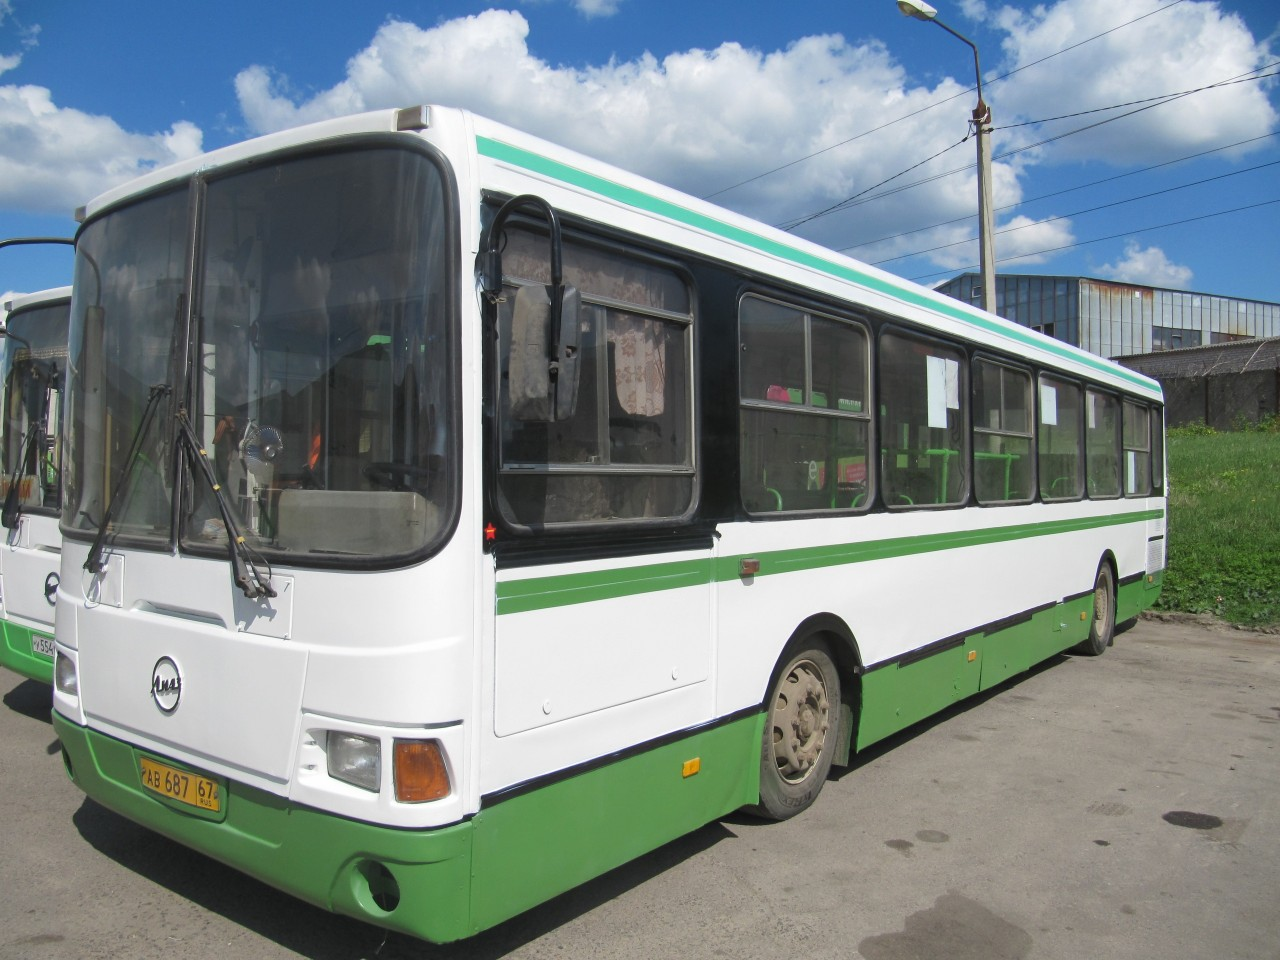 МУП Автоколонна 1308, автобус (фото vk.com ak1308)